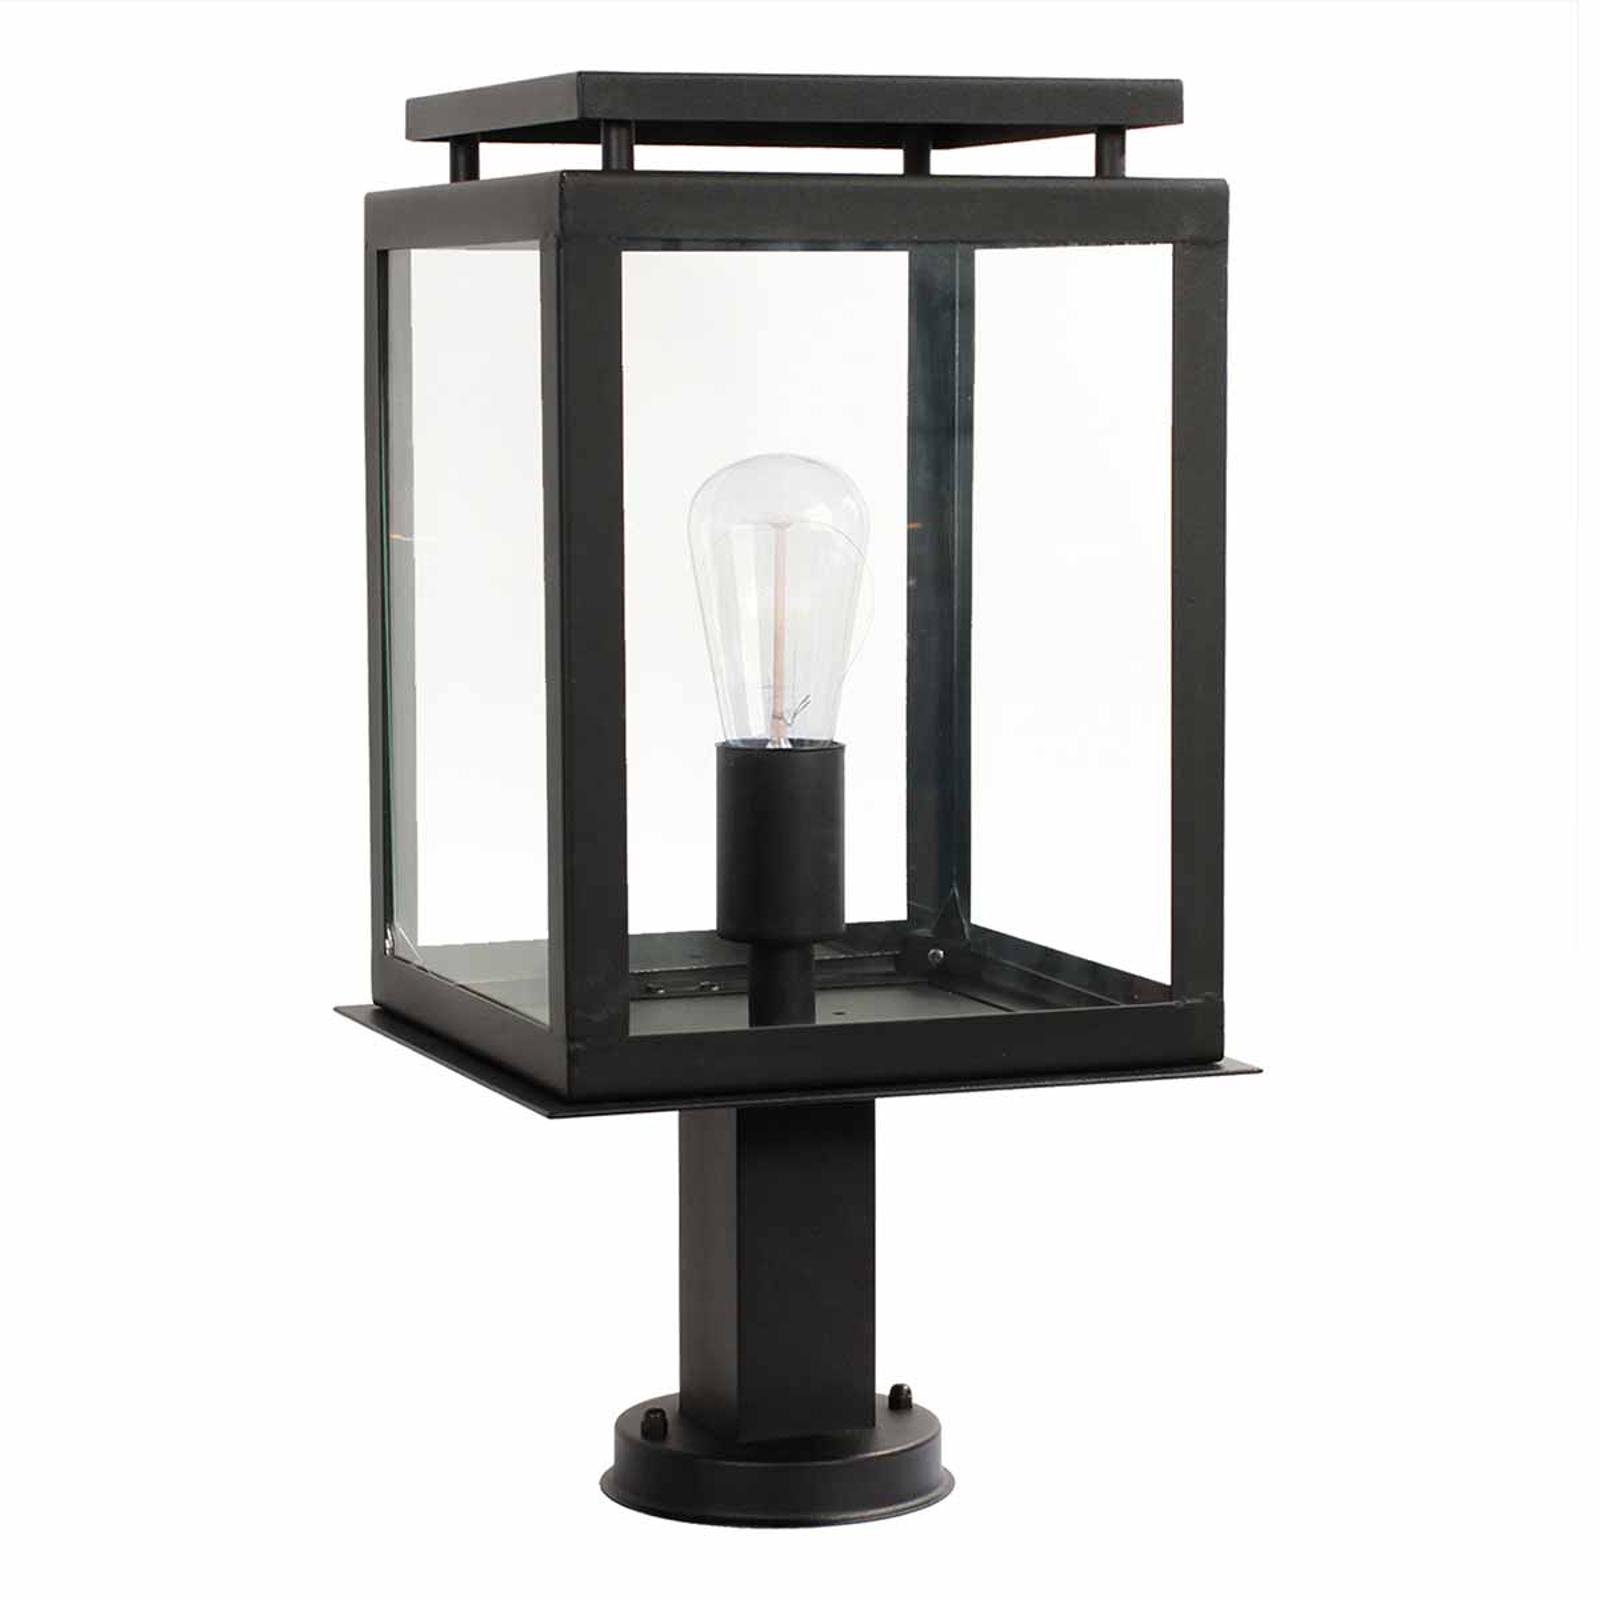 Słupek oświetleniowy de Vecht, czarny, IP44